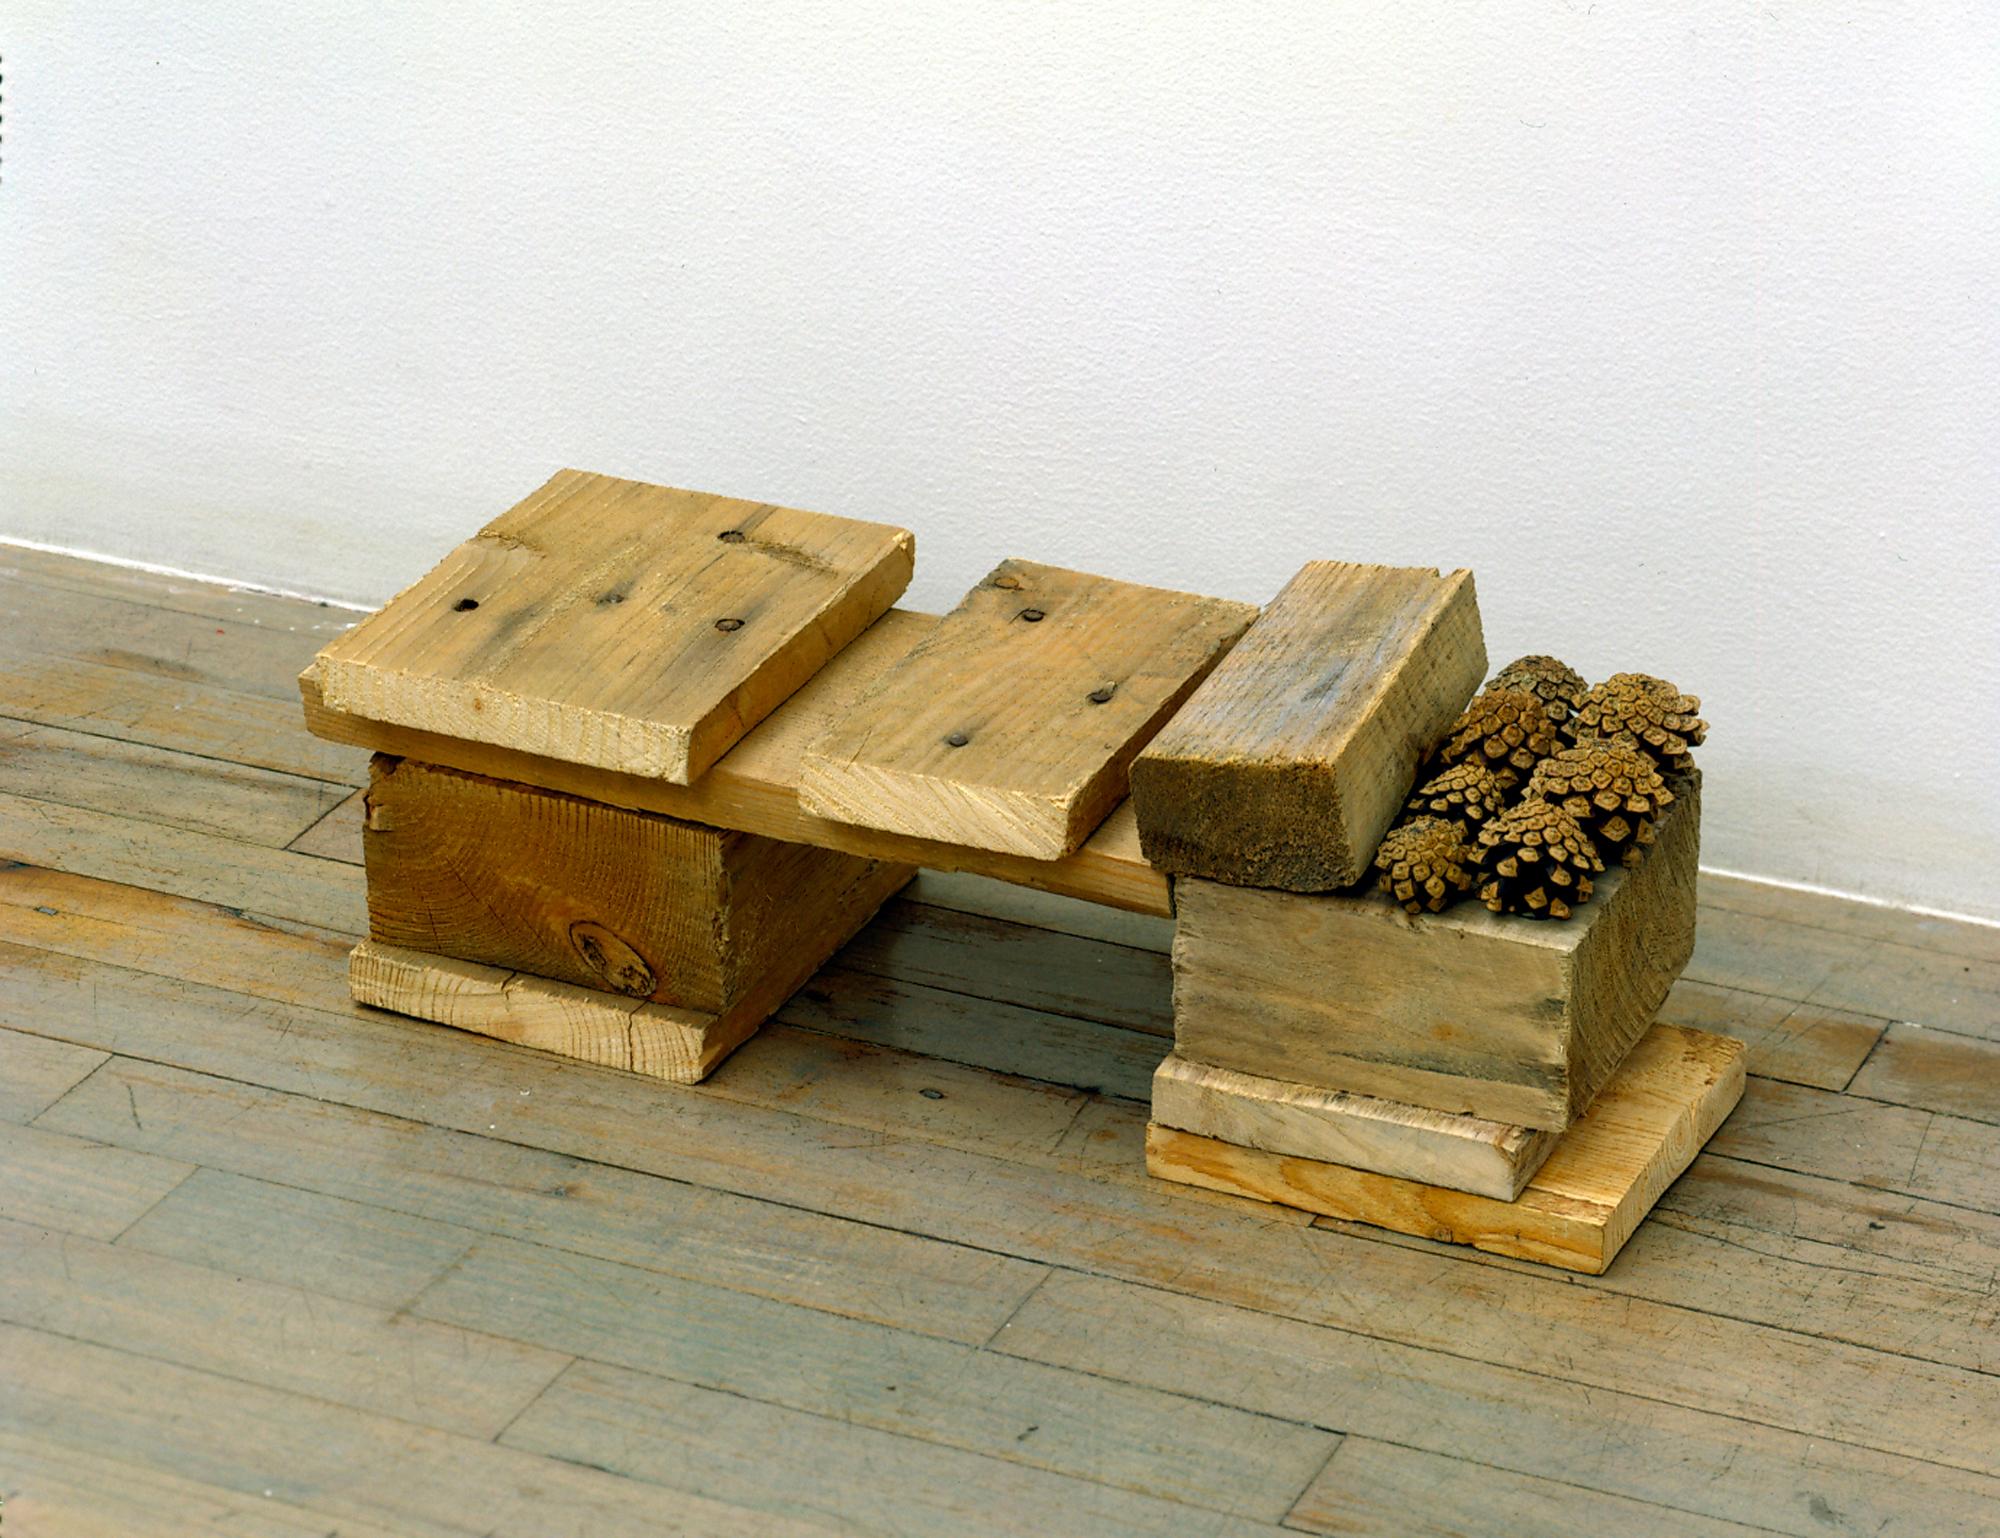 Helen Mirra, Unirondack, 2006, pallet wood, pine cones, 7 1/6 x 19 1/4 x 7 1/8 inches